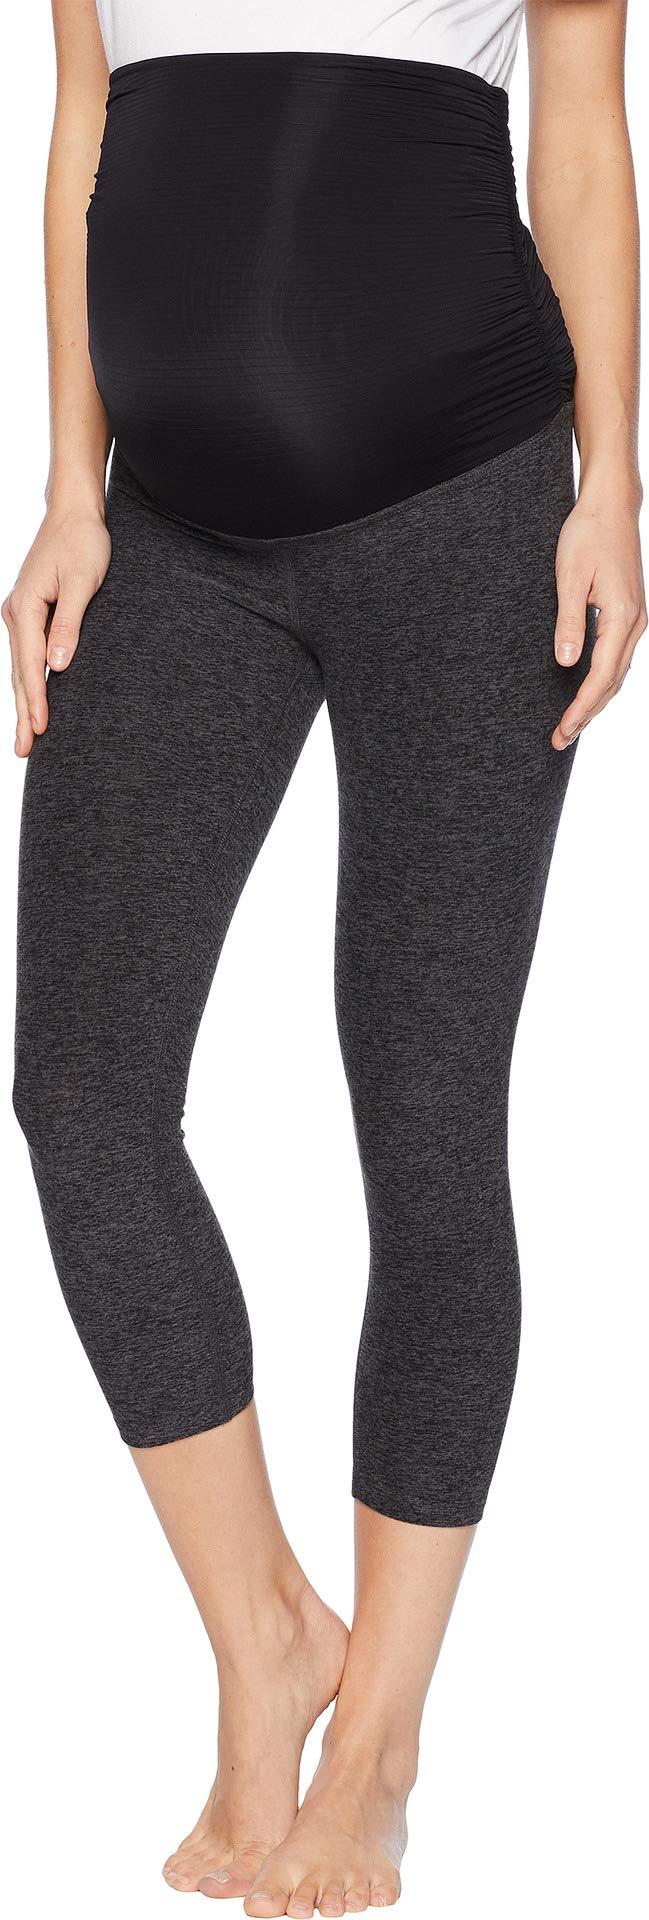 Beyond Yoga Women's Fold Down Maternity Capri Leggings Black Charcoal X-Small 21 21